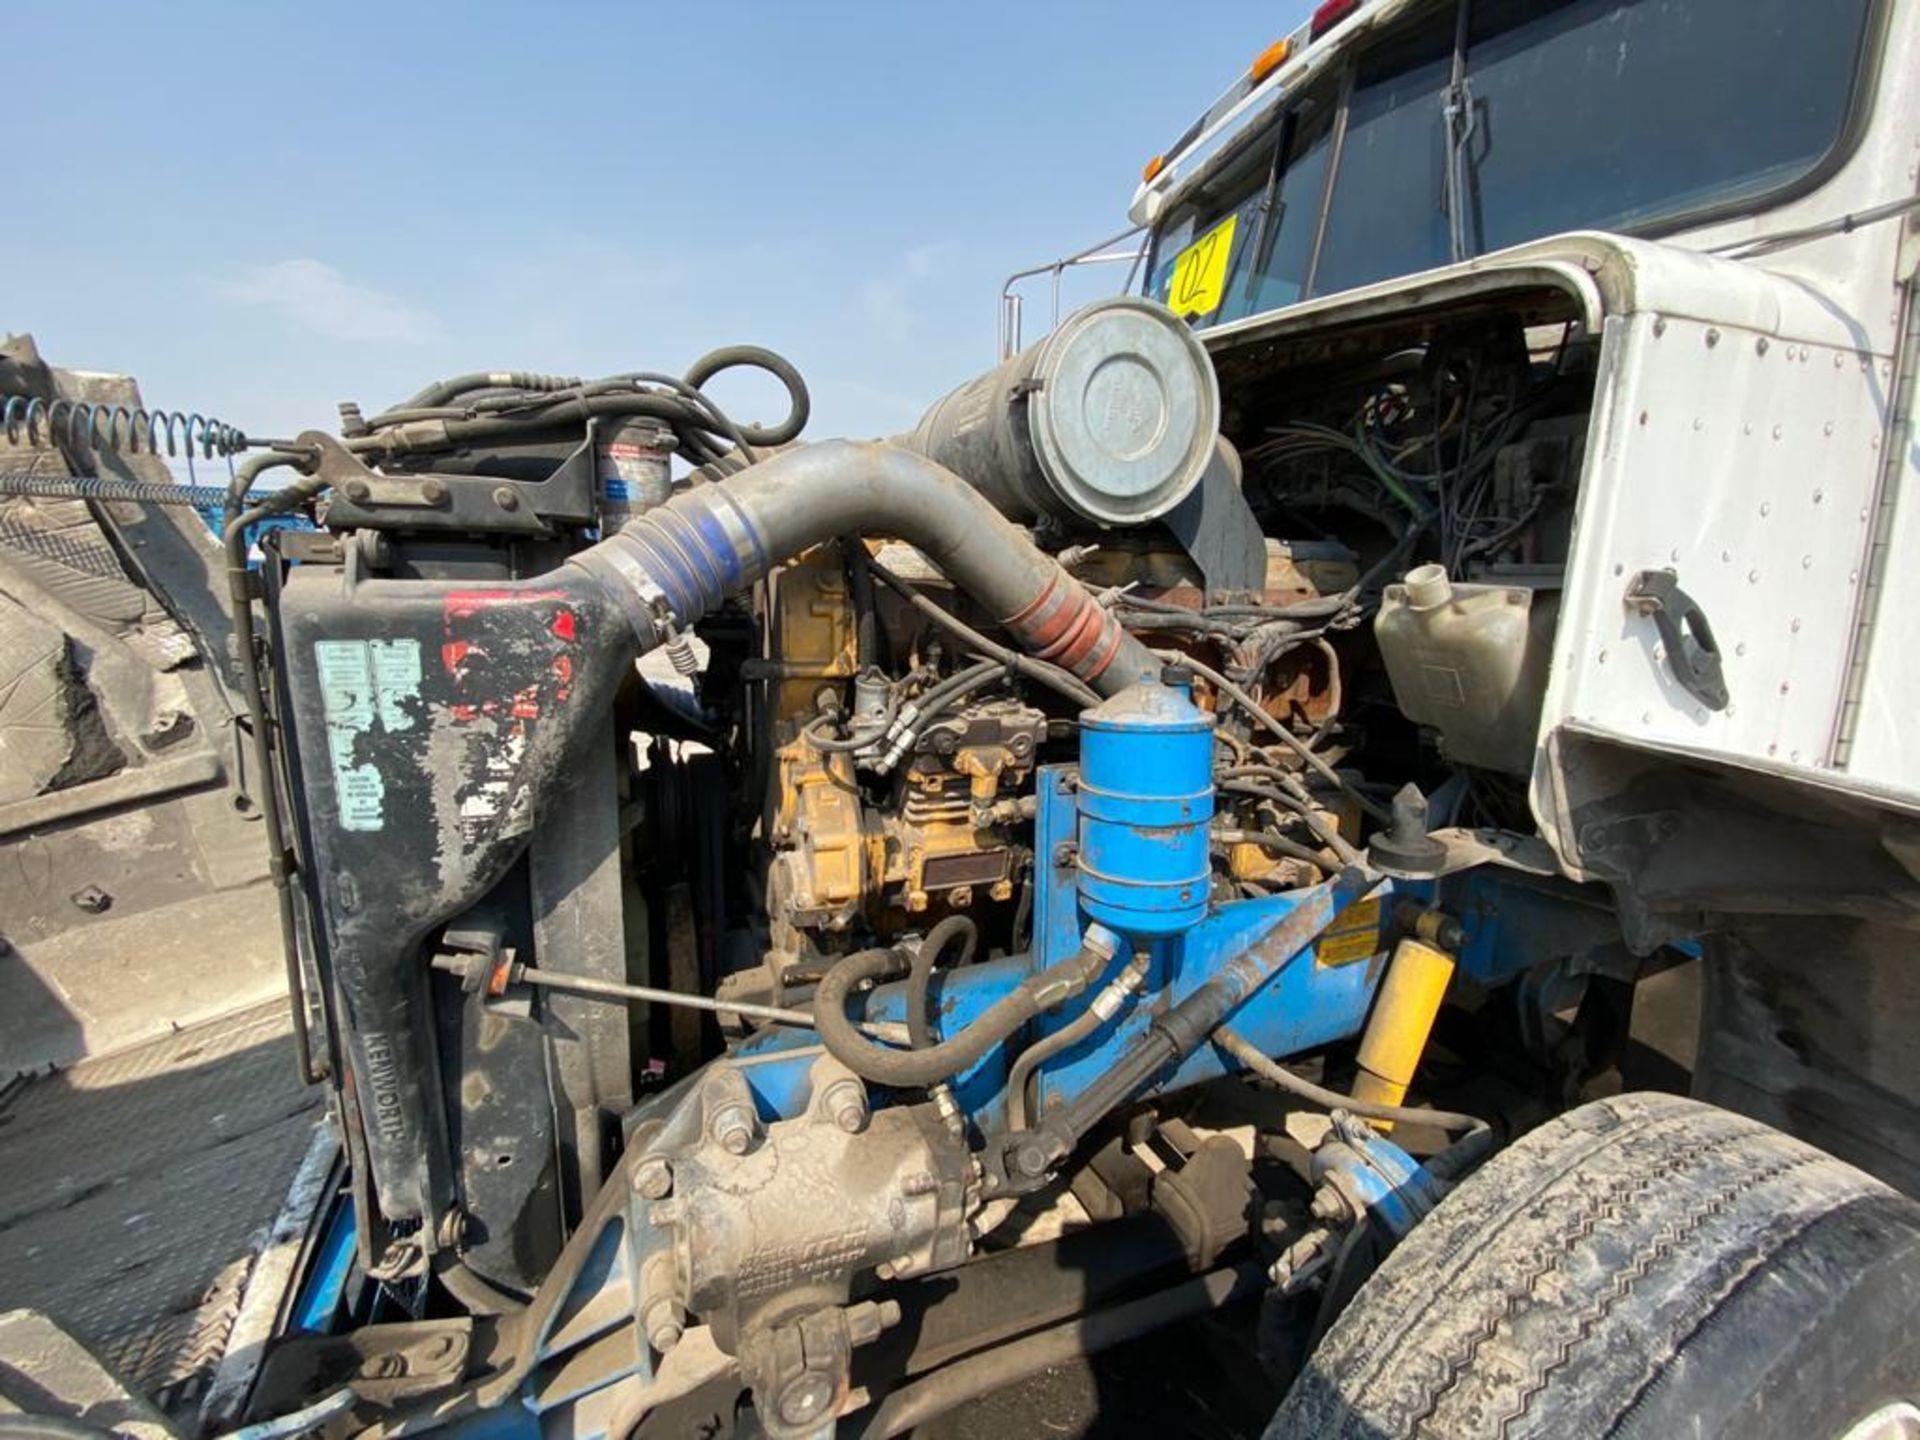 1999 Kenworth Sleeper truck tractor, standard transmission of 18 speeds - Image 65 of 75